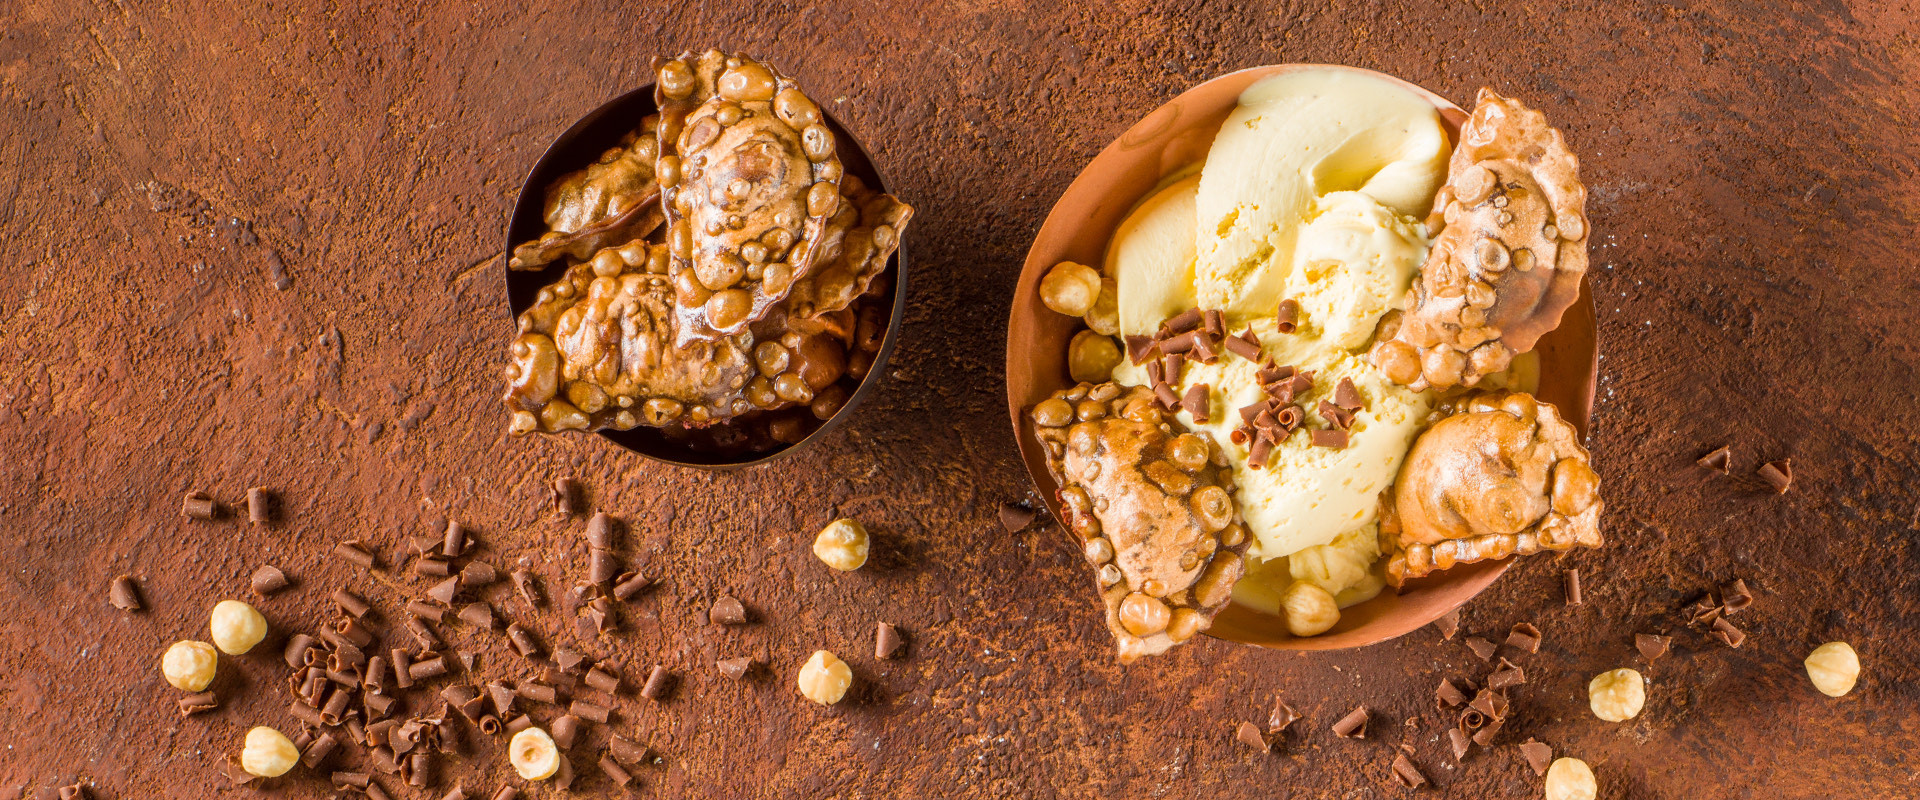 IT-ricette-ravioli-cioccolato-gelato-nocciola-riccioli-D.jpg